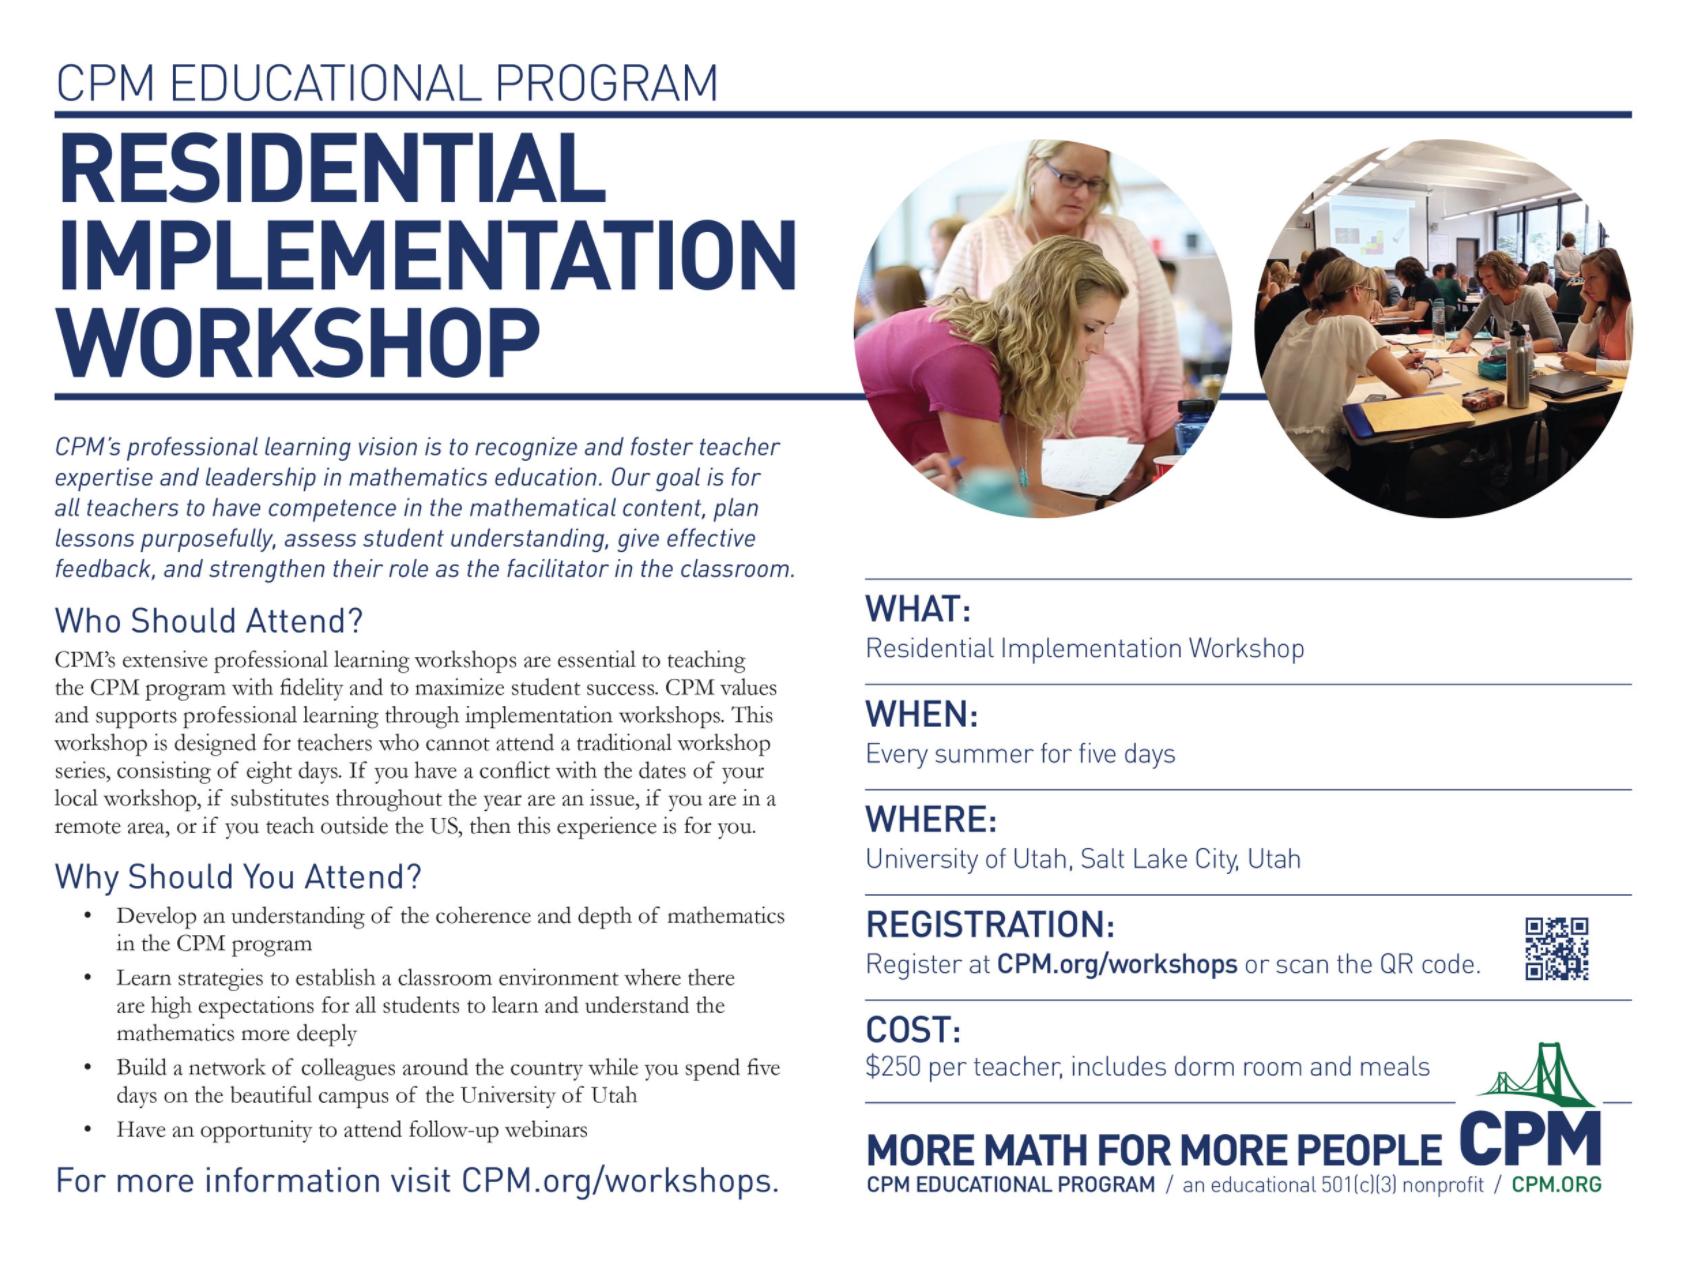 Image of the Residential Implementation Workshop Flyer